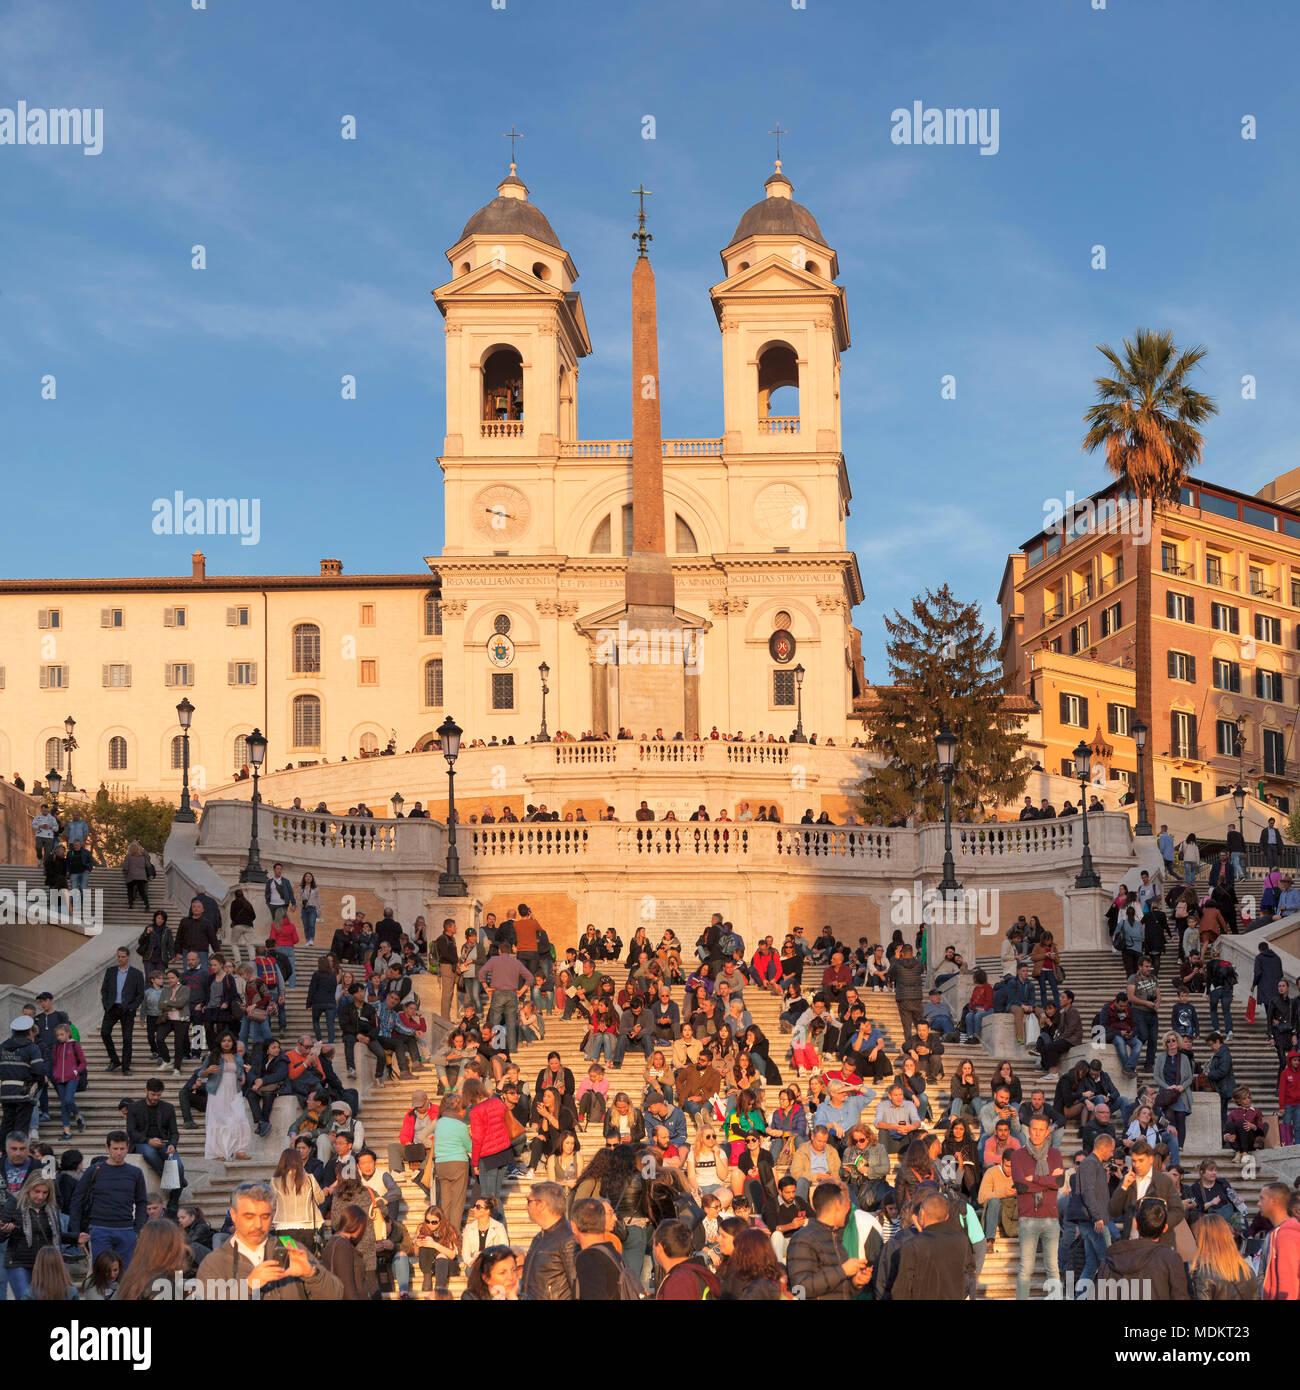 Les escaliers espagnols avec l'église Santa Trinita dei Monti, Piazza di Spagna, Rome, Latium, Italie Banque D'Images